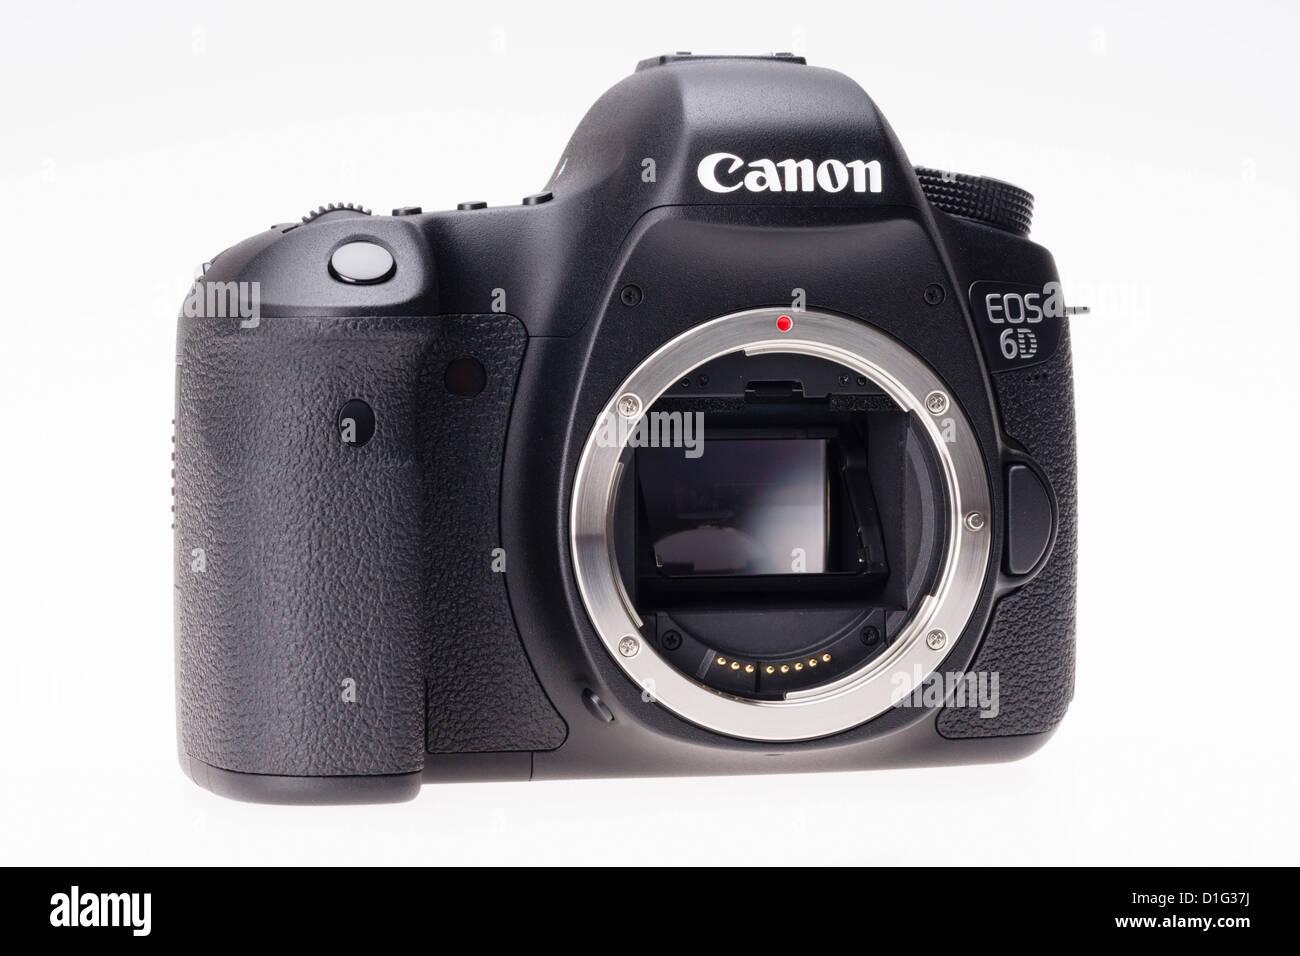 Photographic equipment - Canon EOS 6D full frame DSLR, budget price ...